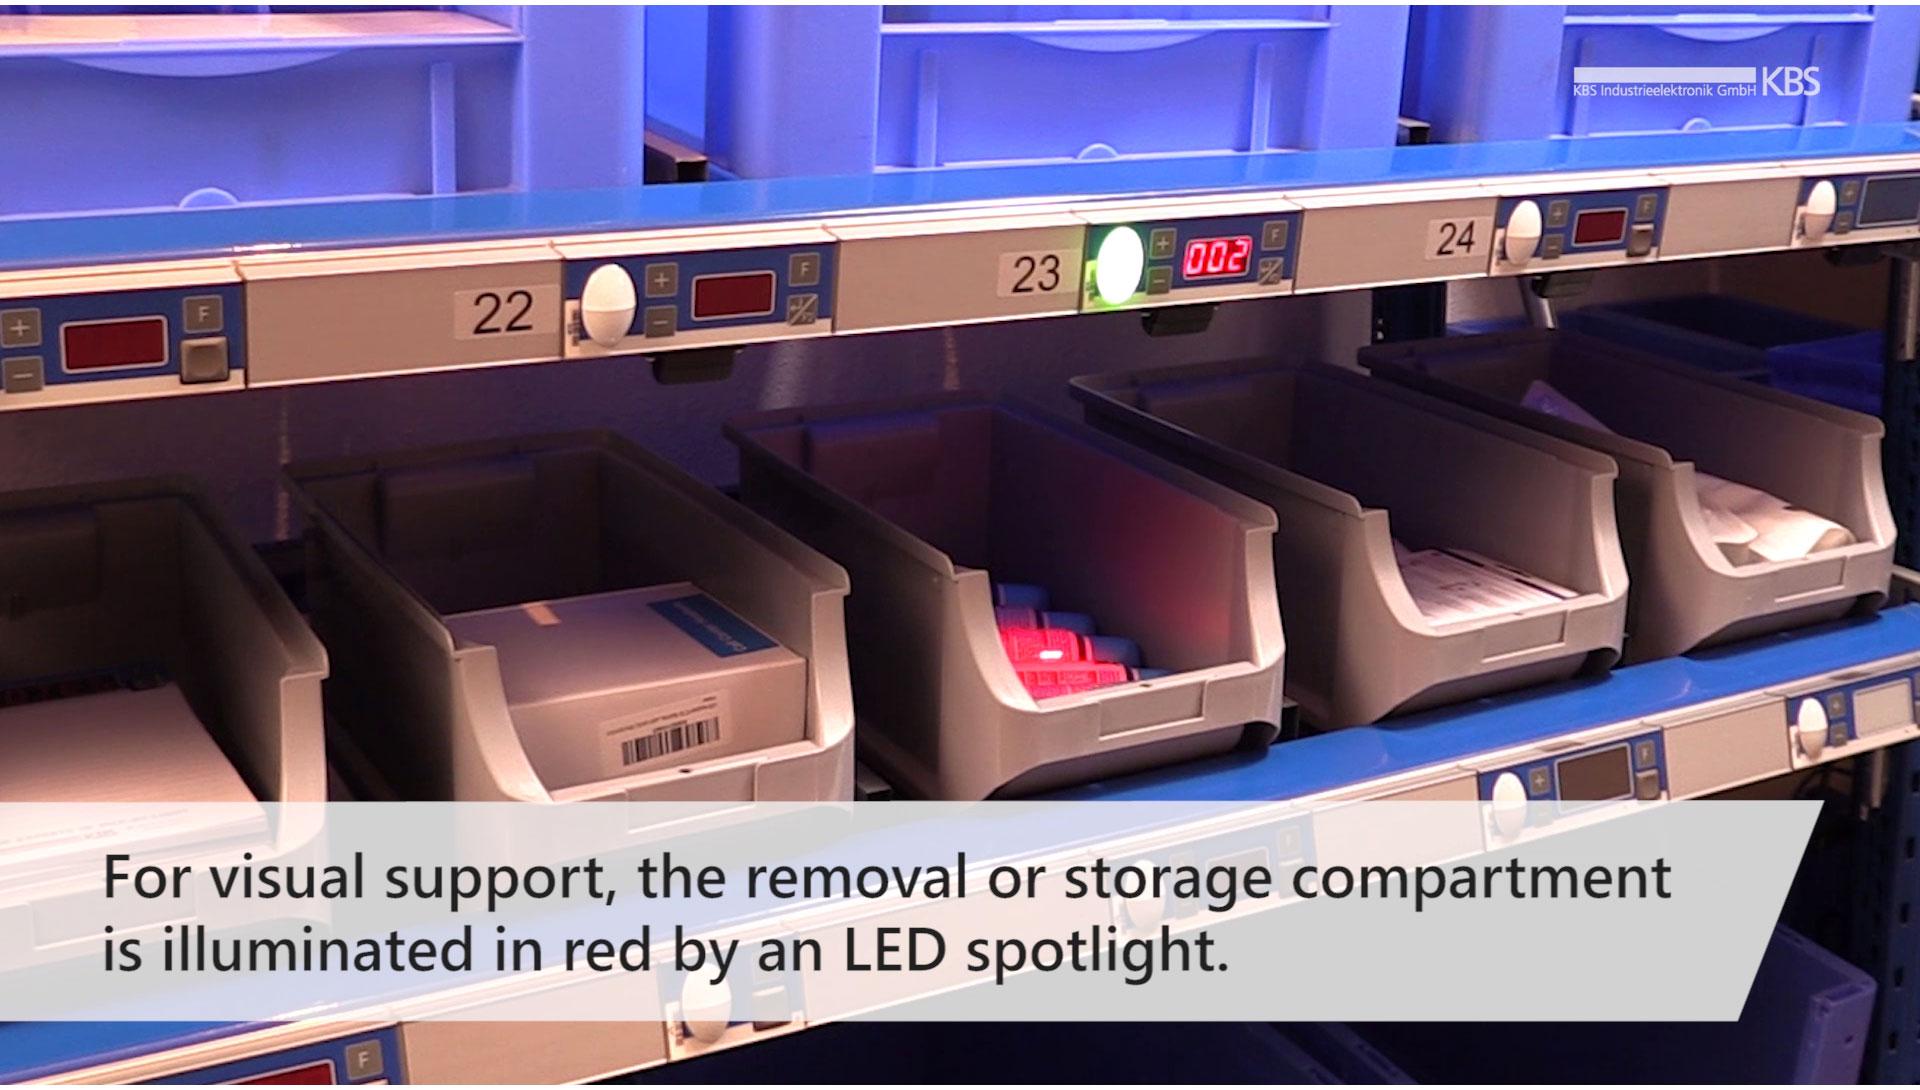 video image led pointer illuminates storage compartment